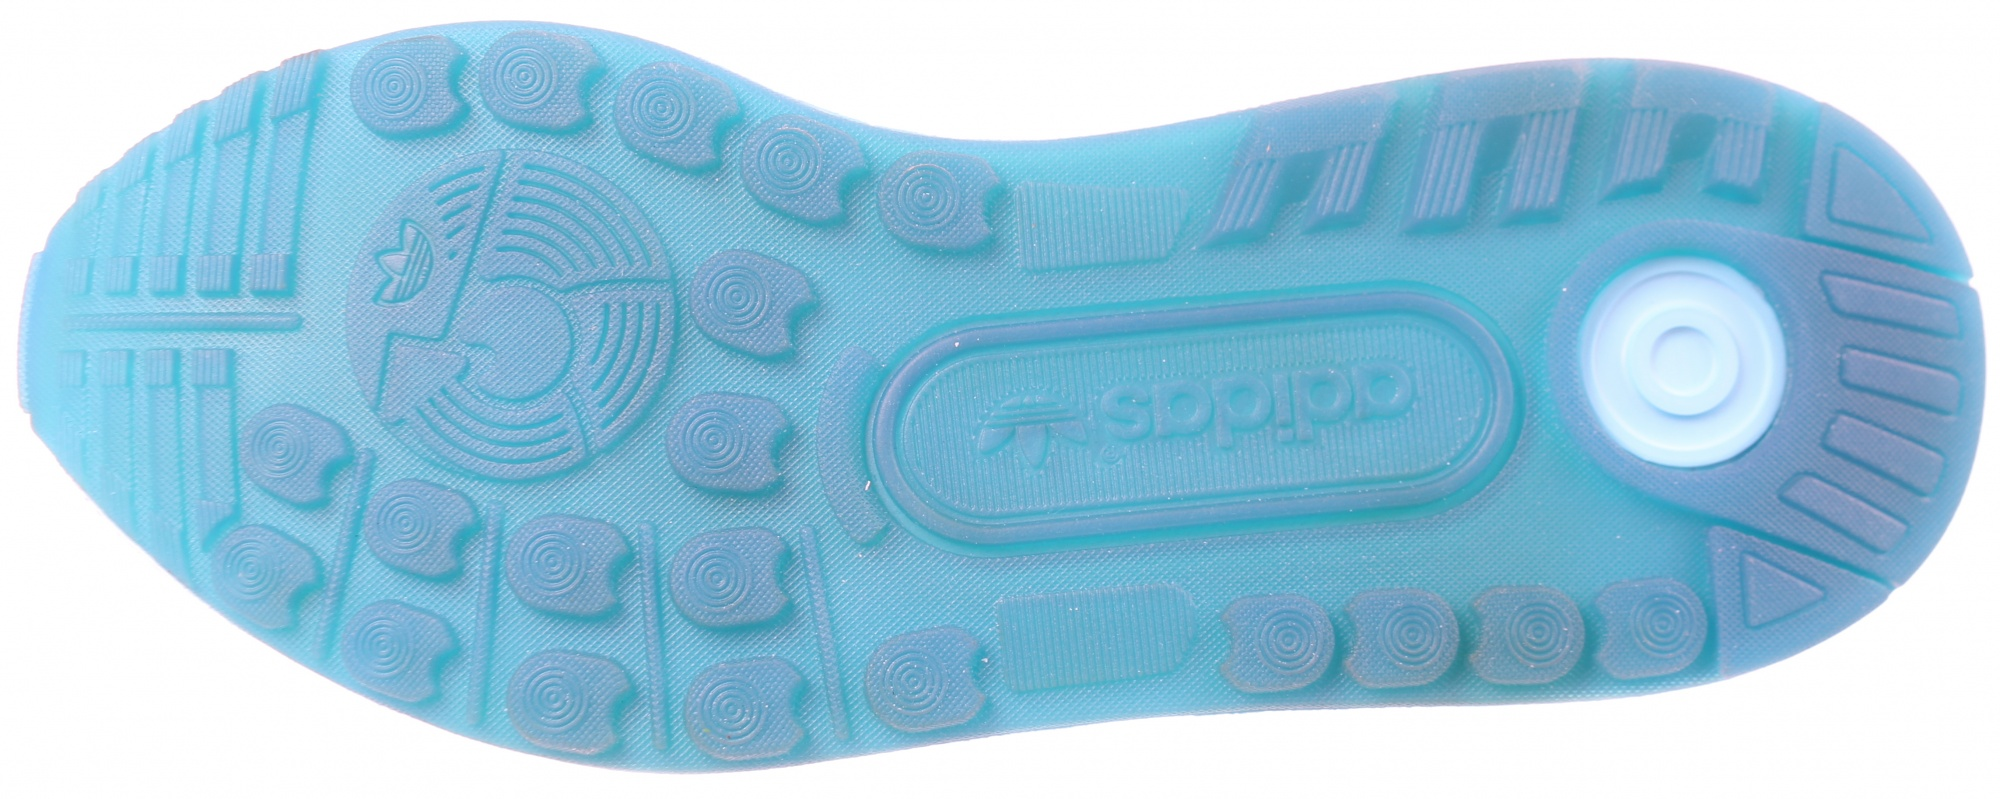 adidas sneakers ZX Flux ADV Herren weiß Internet Sport&Casuals